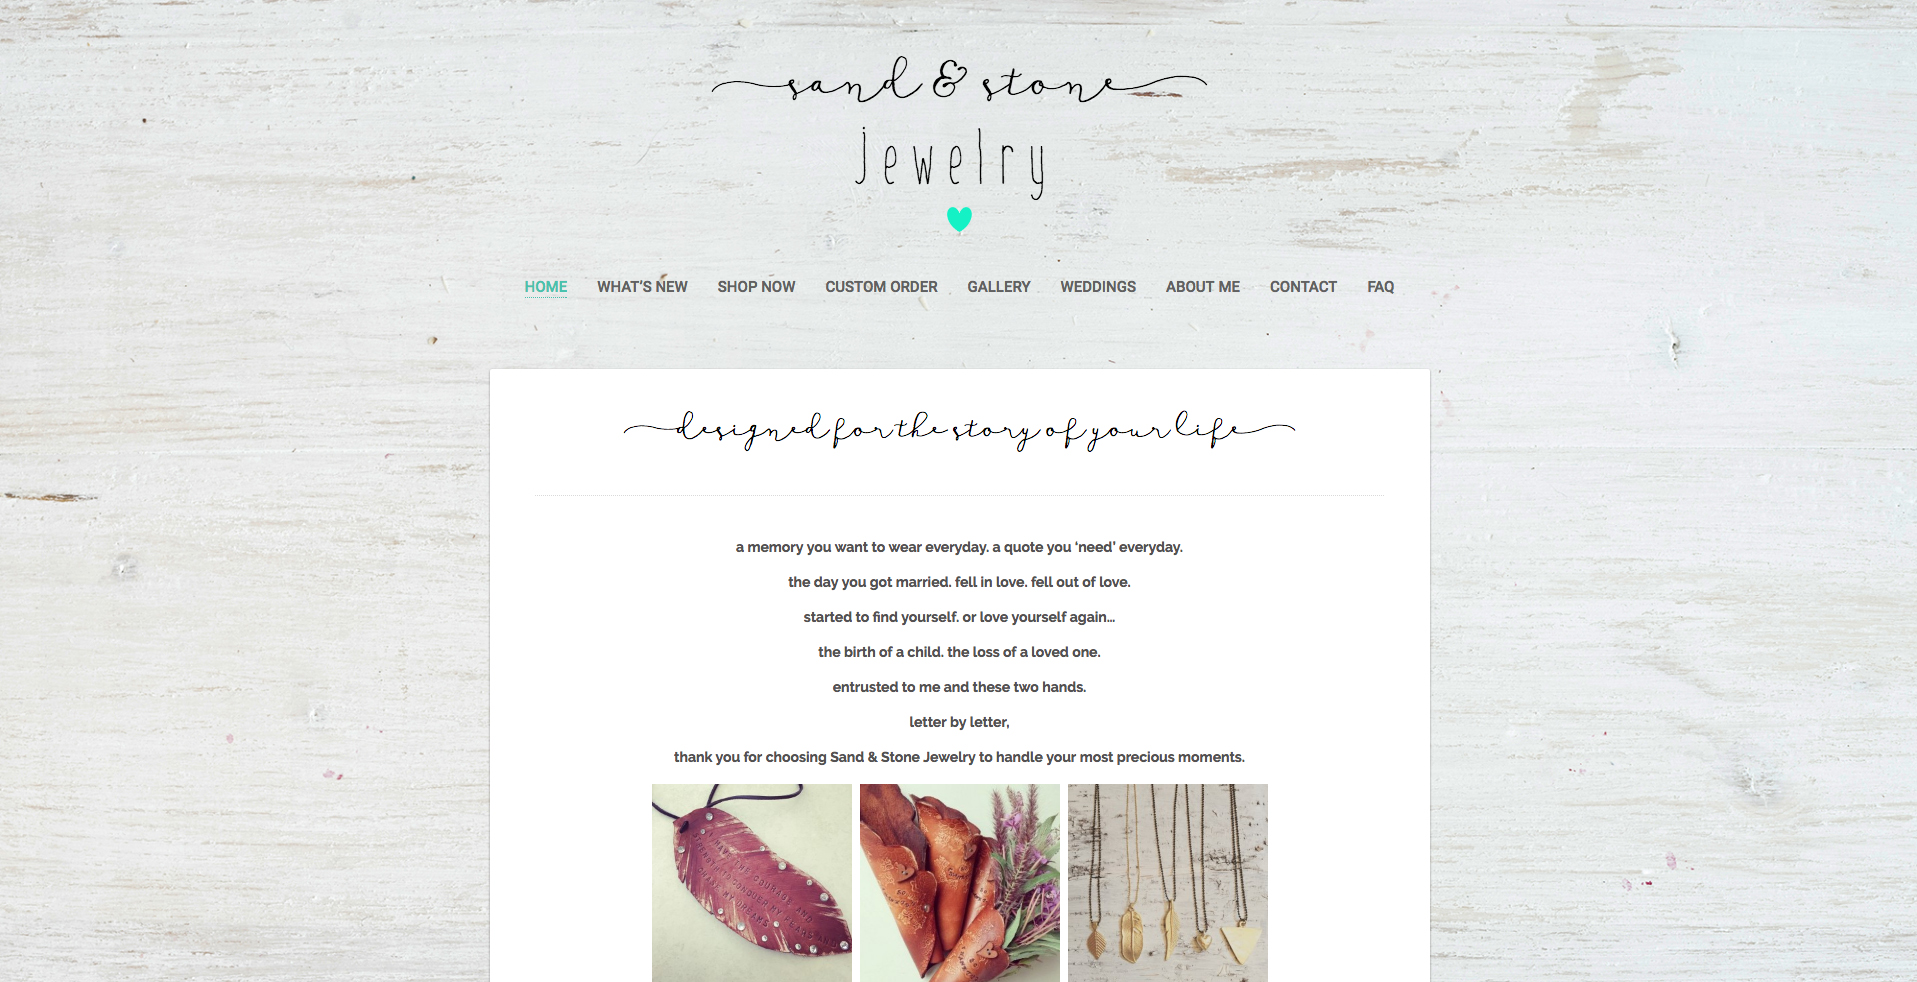 sandandstonejewelry